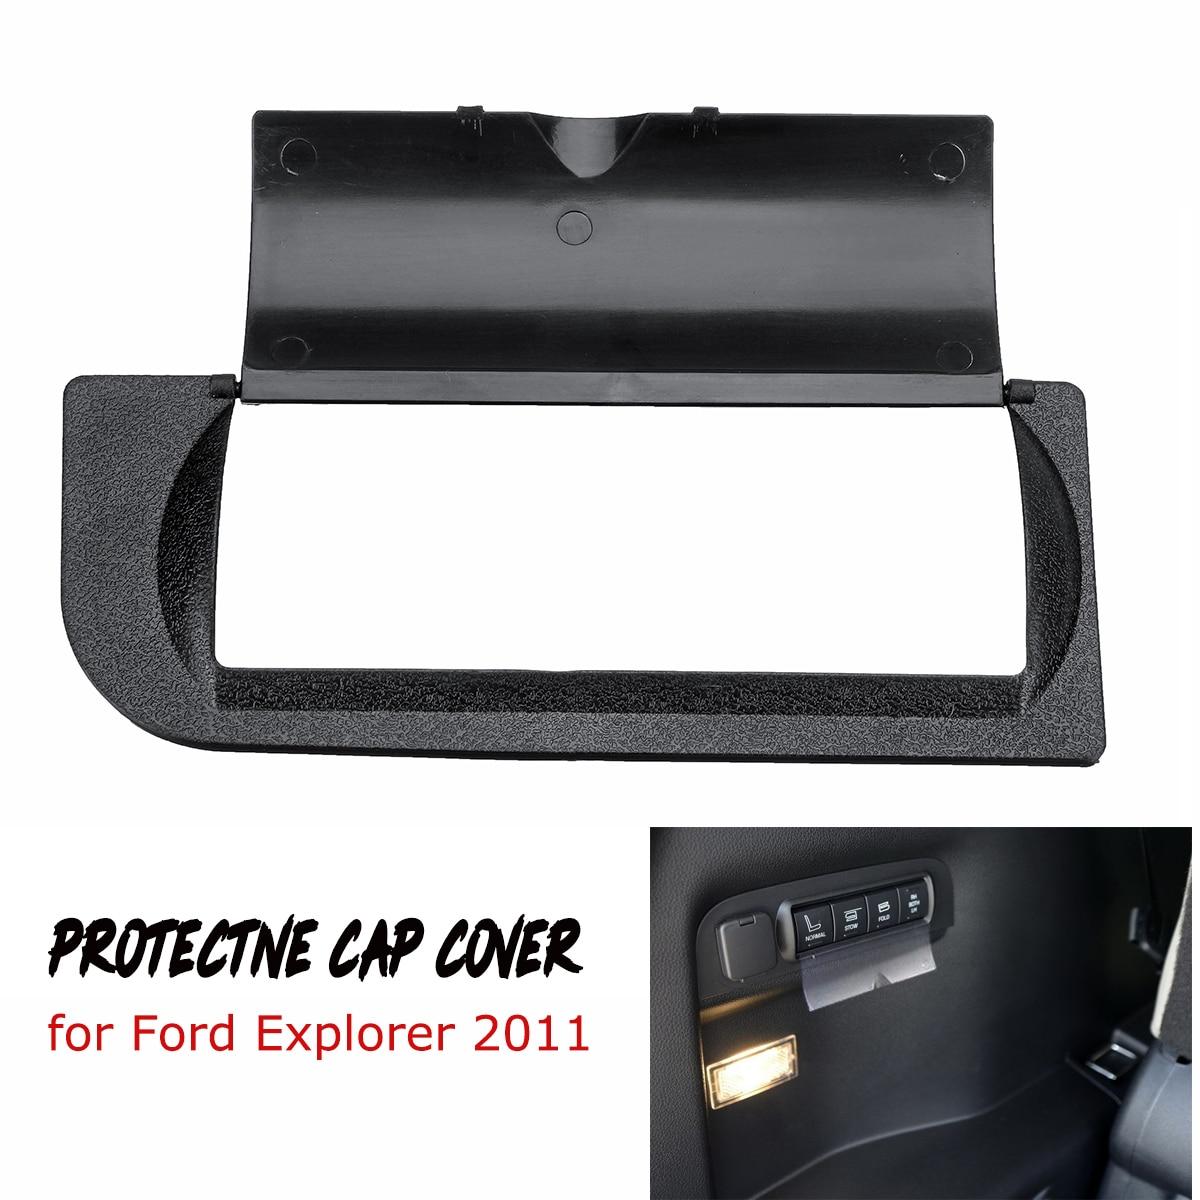 Buy car interior abs protective cap cover - 2013 ford explorer interior parts ...